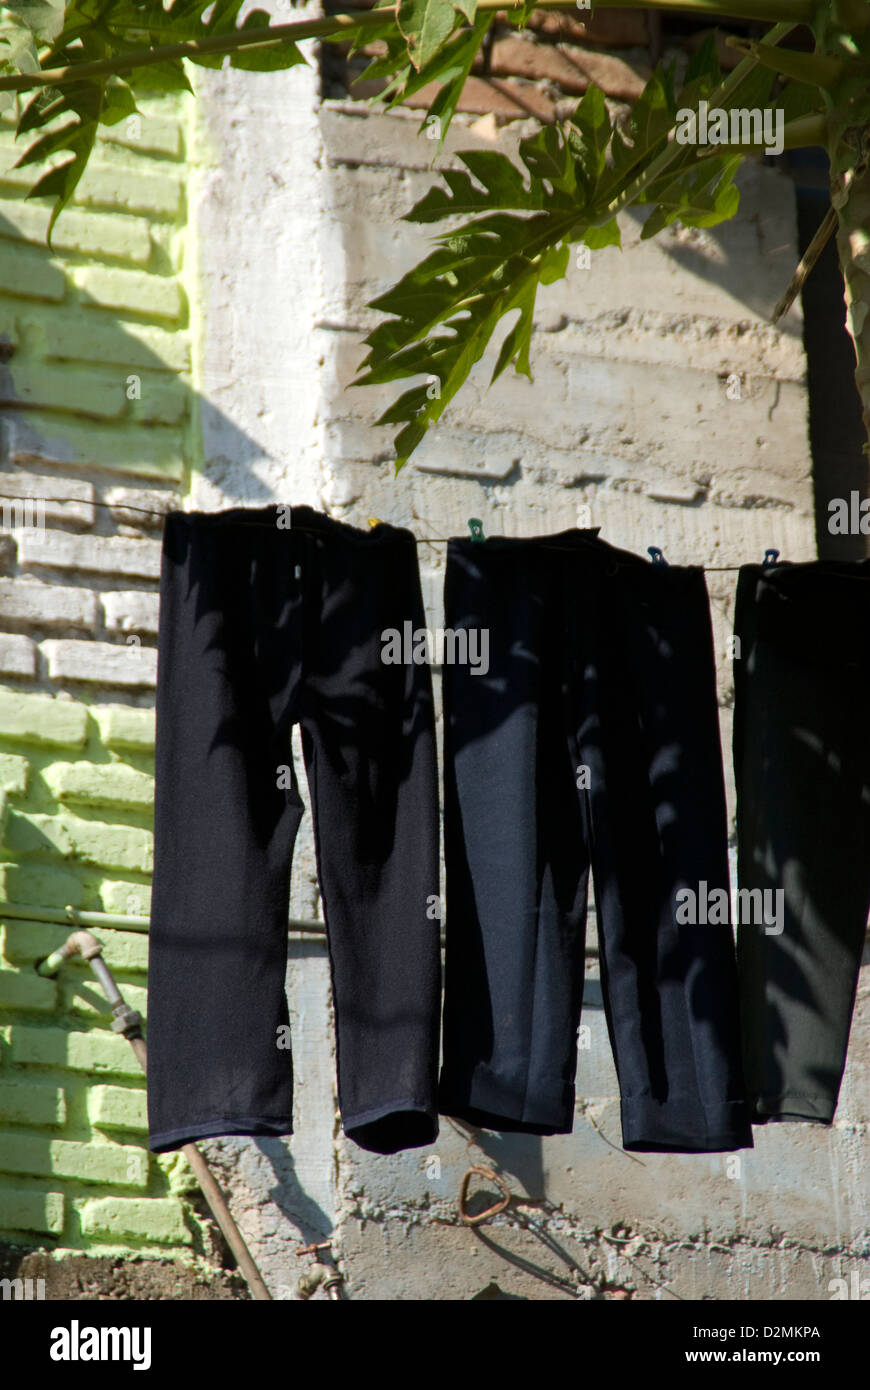 Black pants on a clothesline in a small village near Mazatlan,Mexico - Stock Image